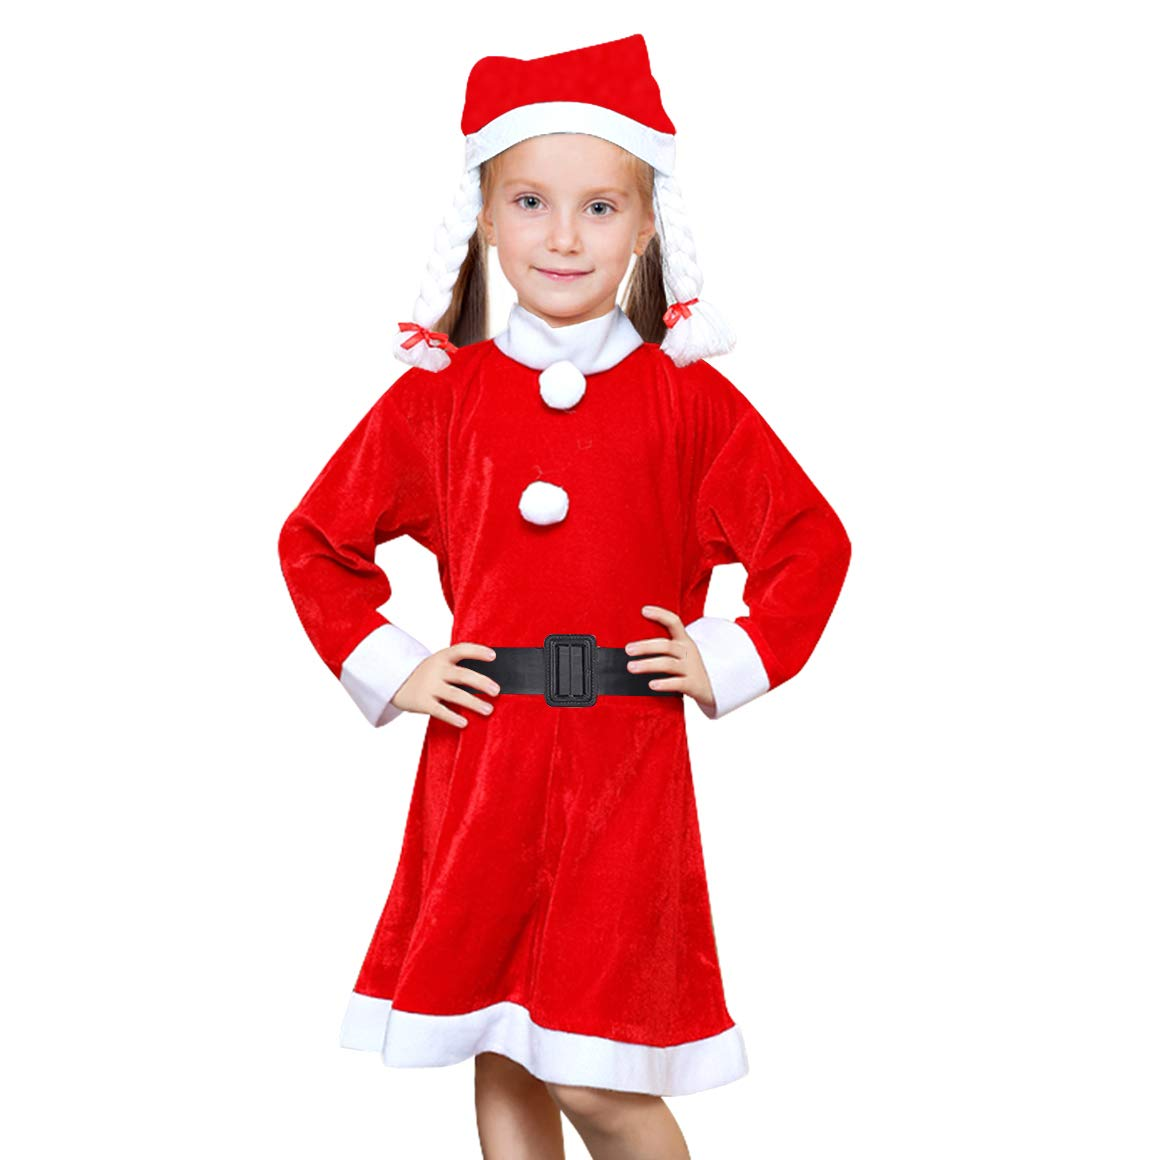 Child Santa Suit Kids Velvet Christmas Costumes with Santa Hat Santa Claus Costume Outfits for Boys Girls